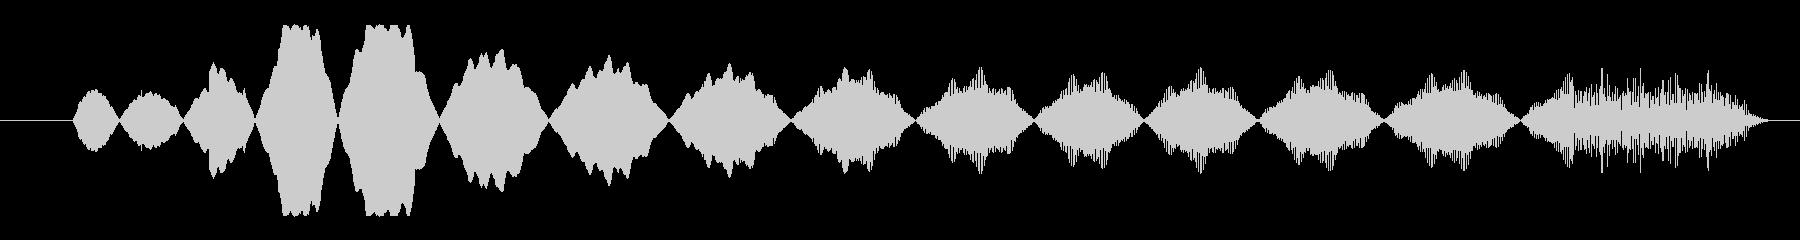 FX アクセス拒否01の未再生の波形